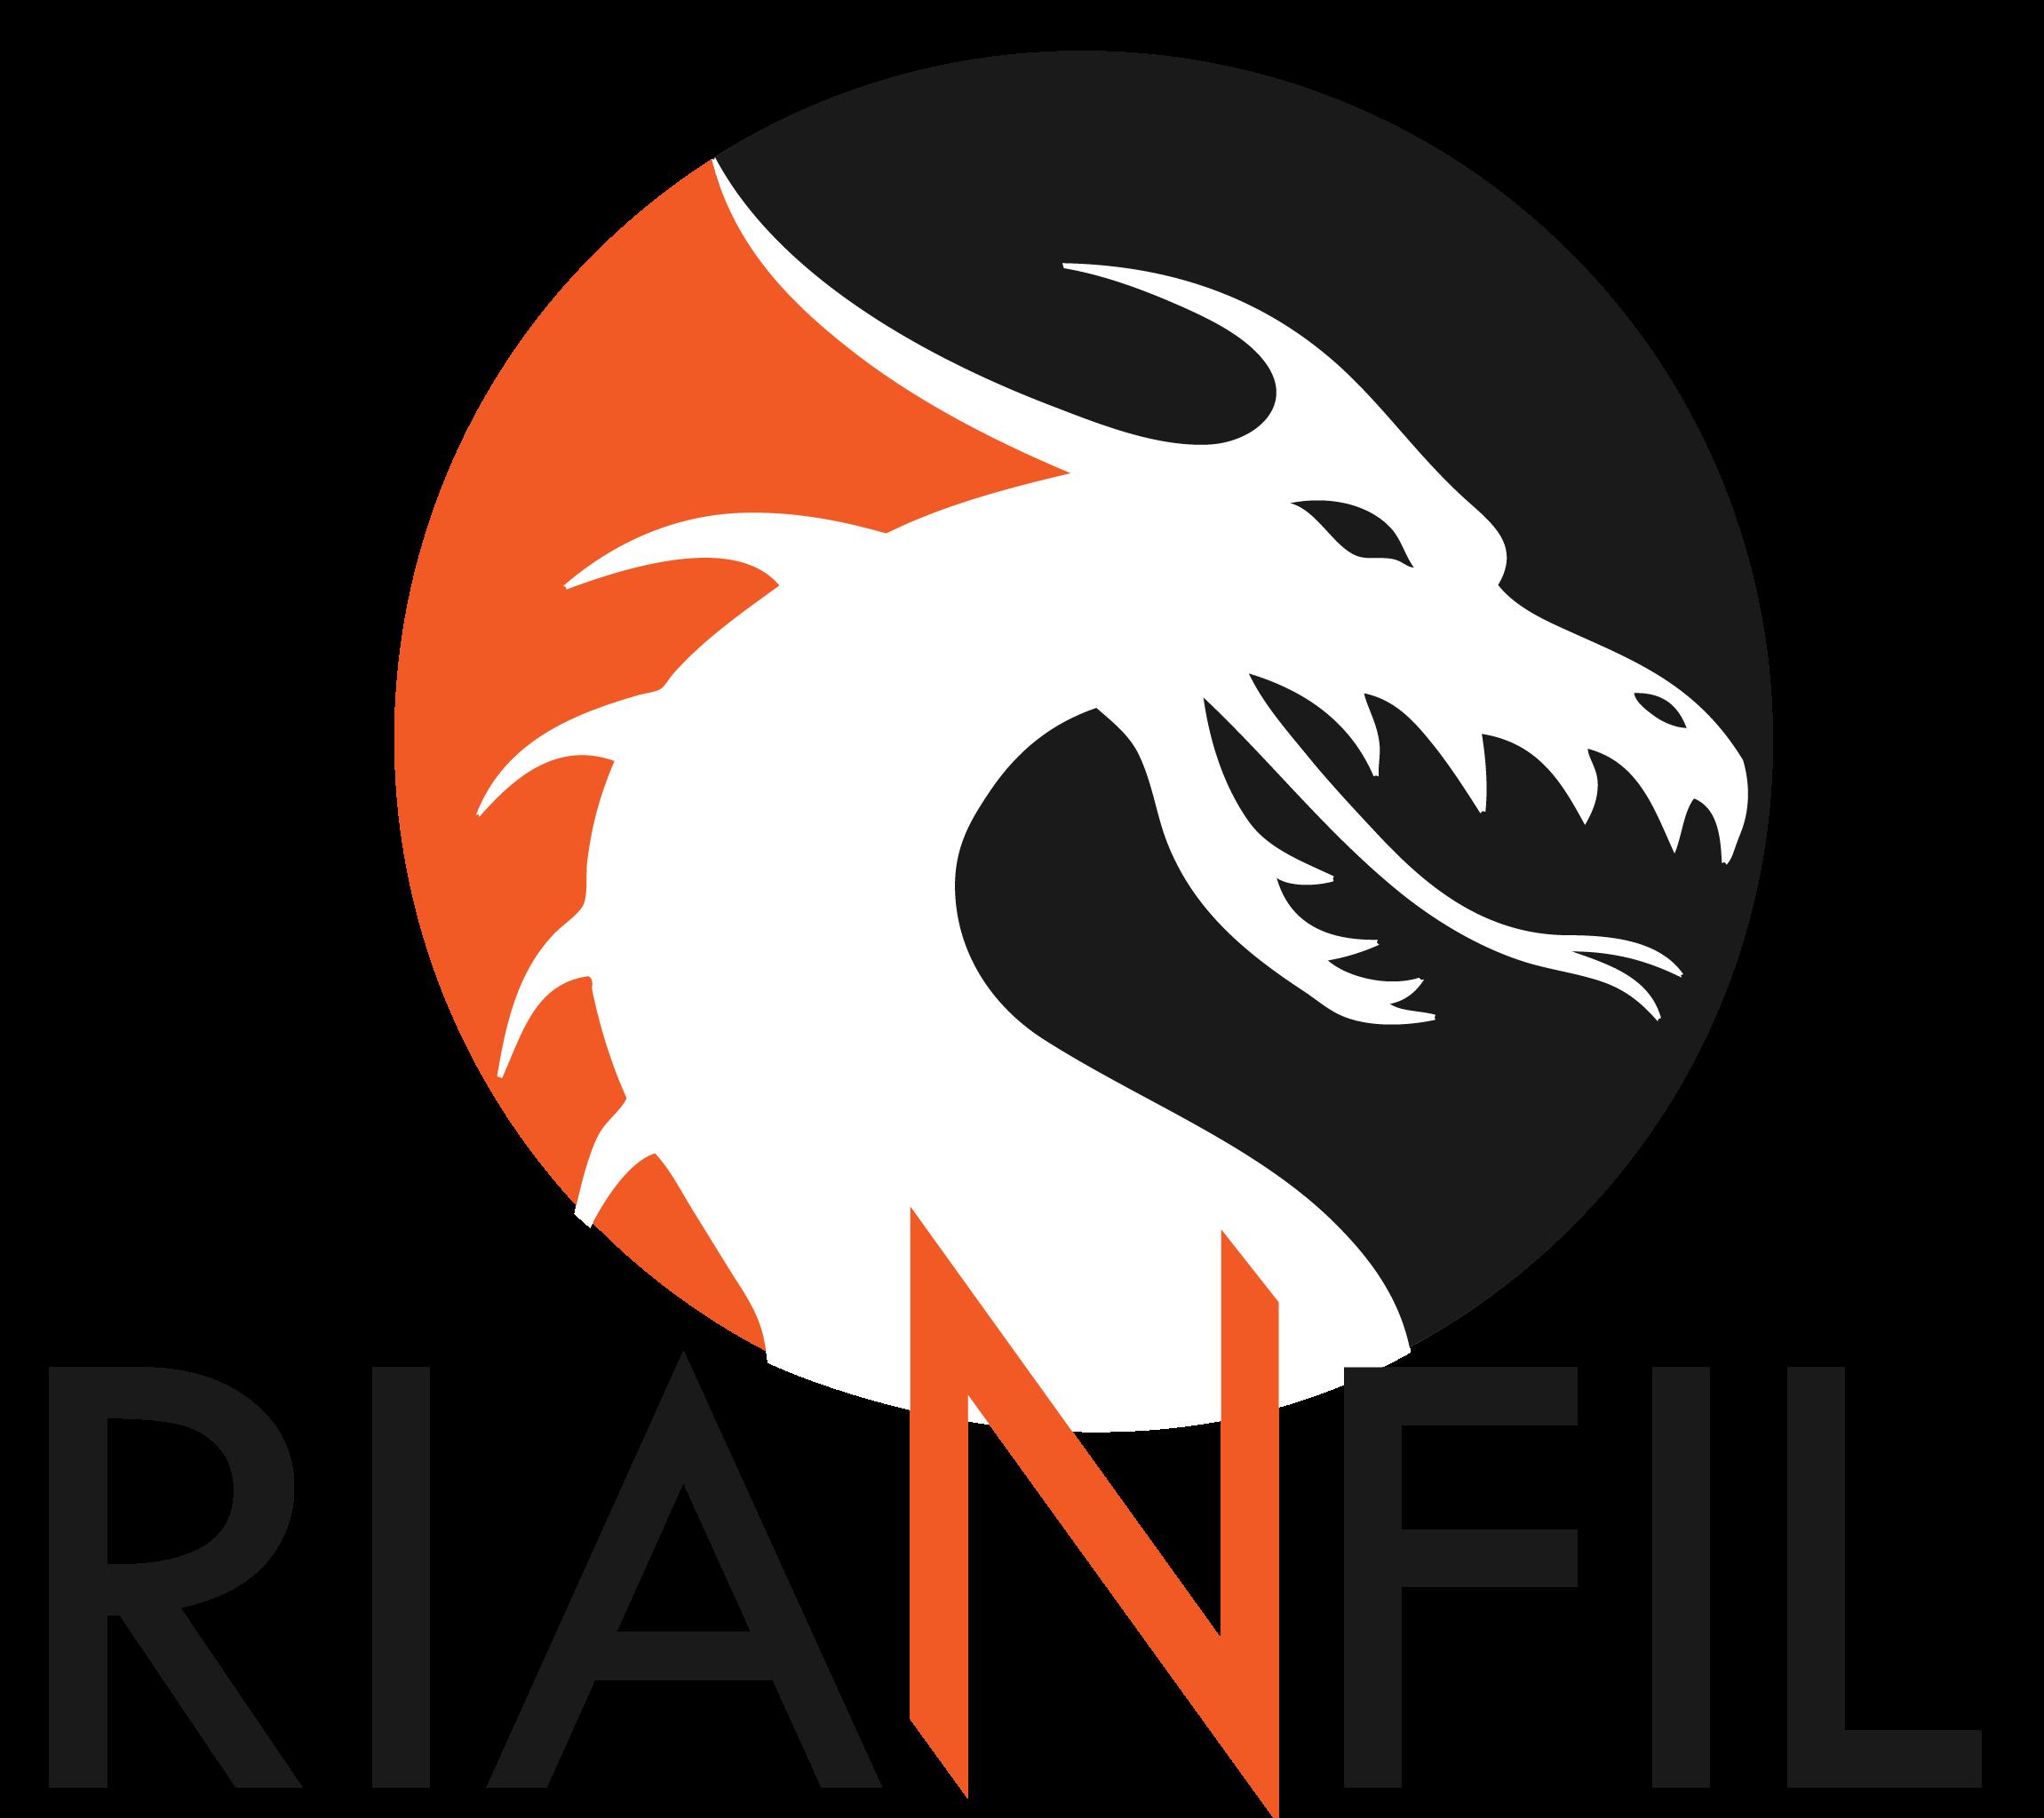 Rianfil